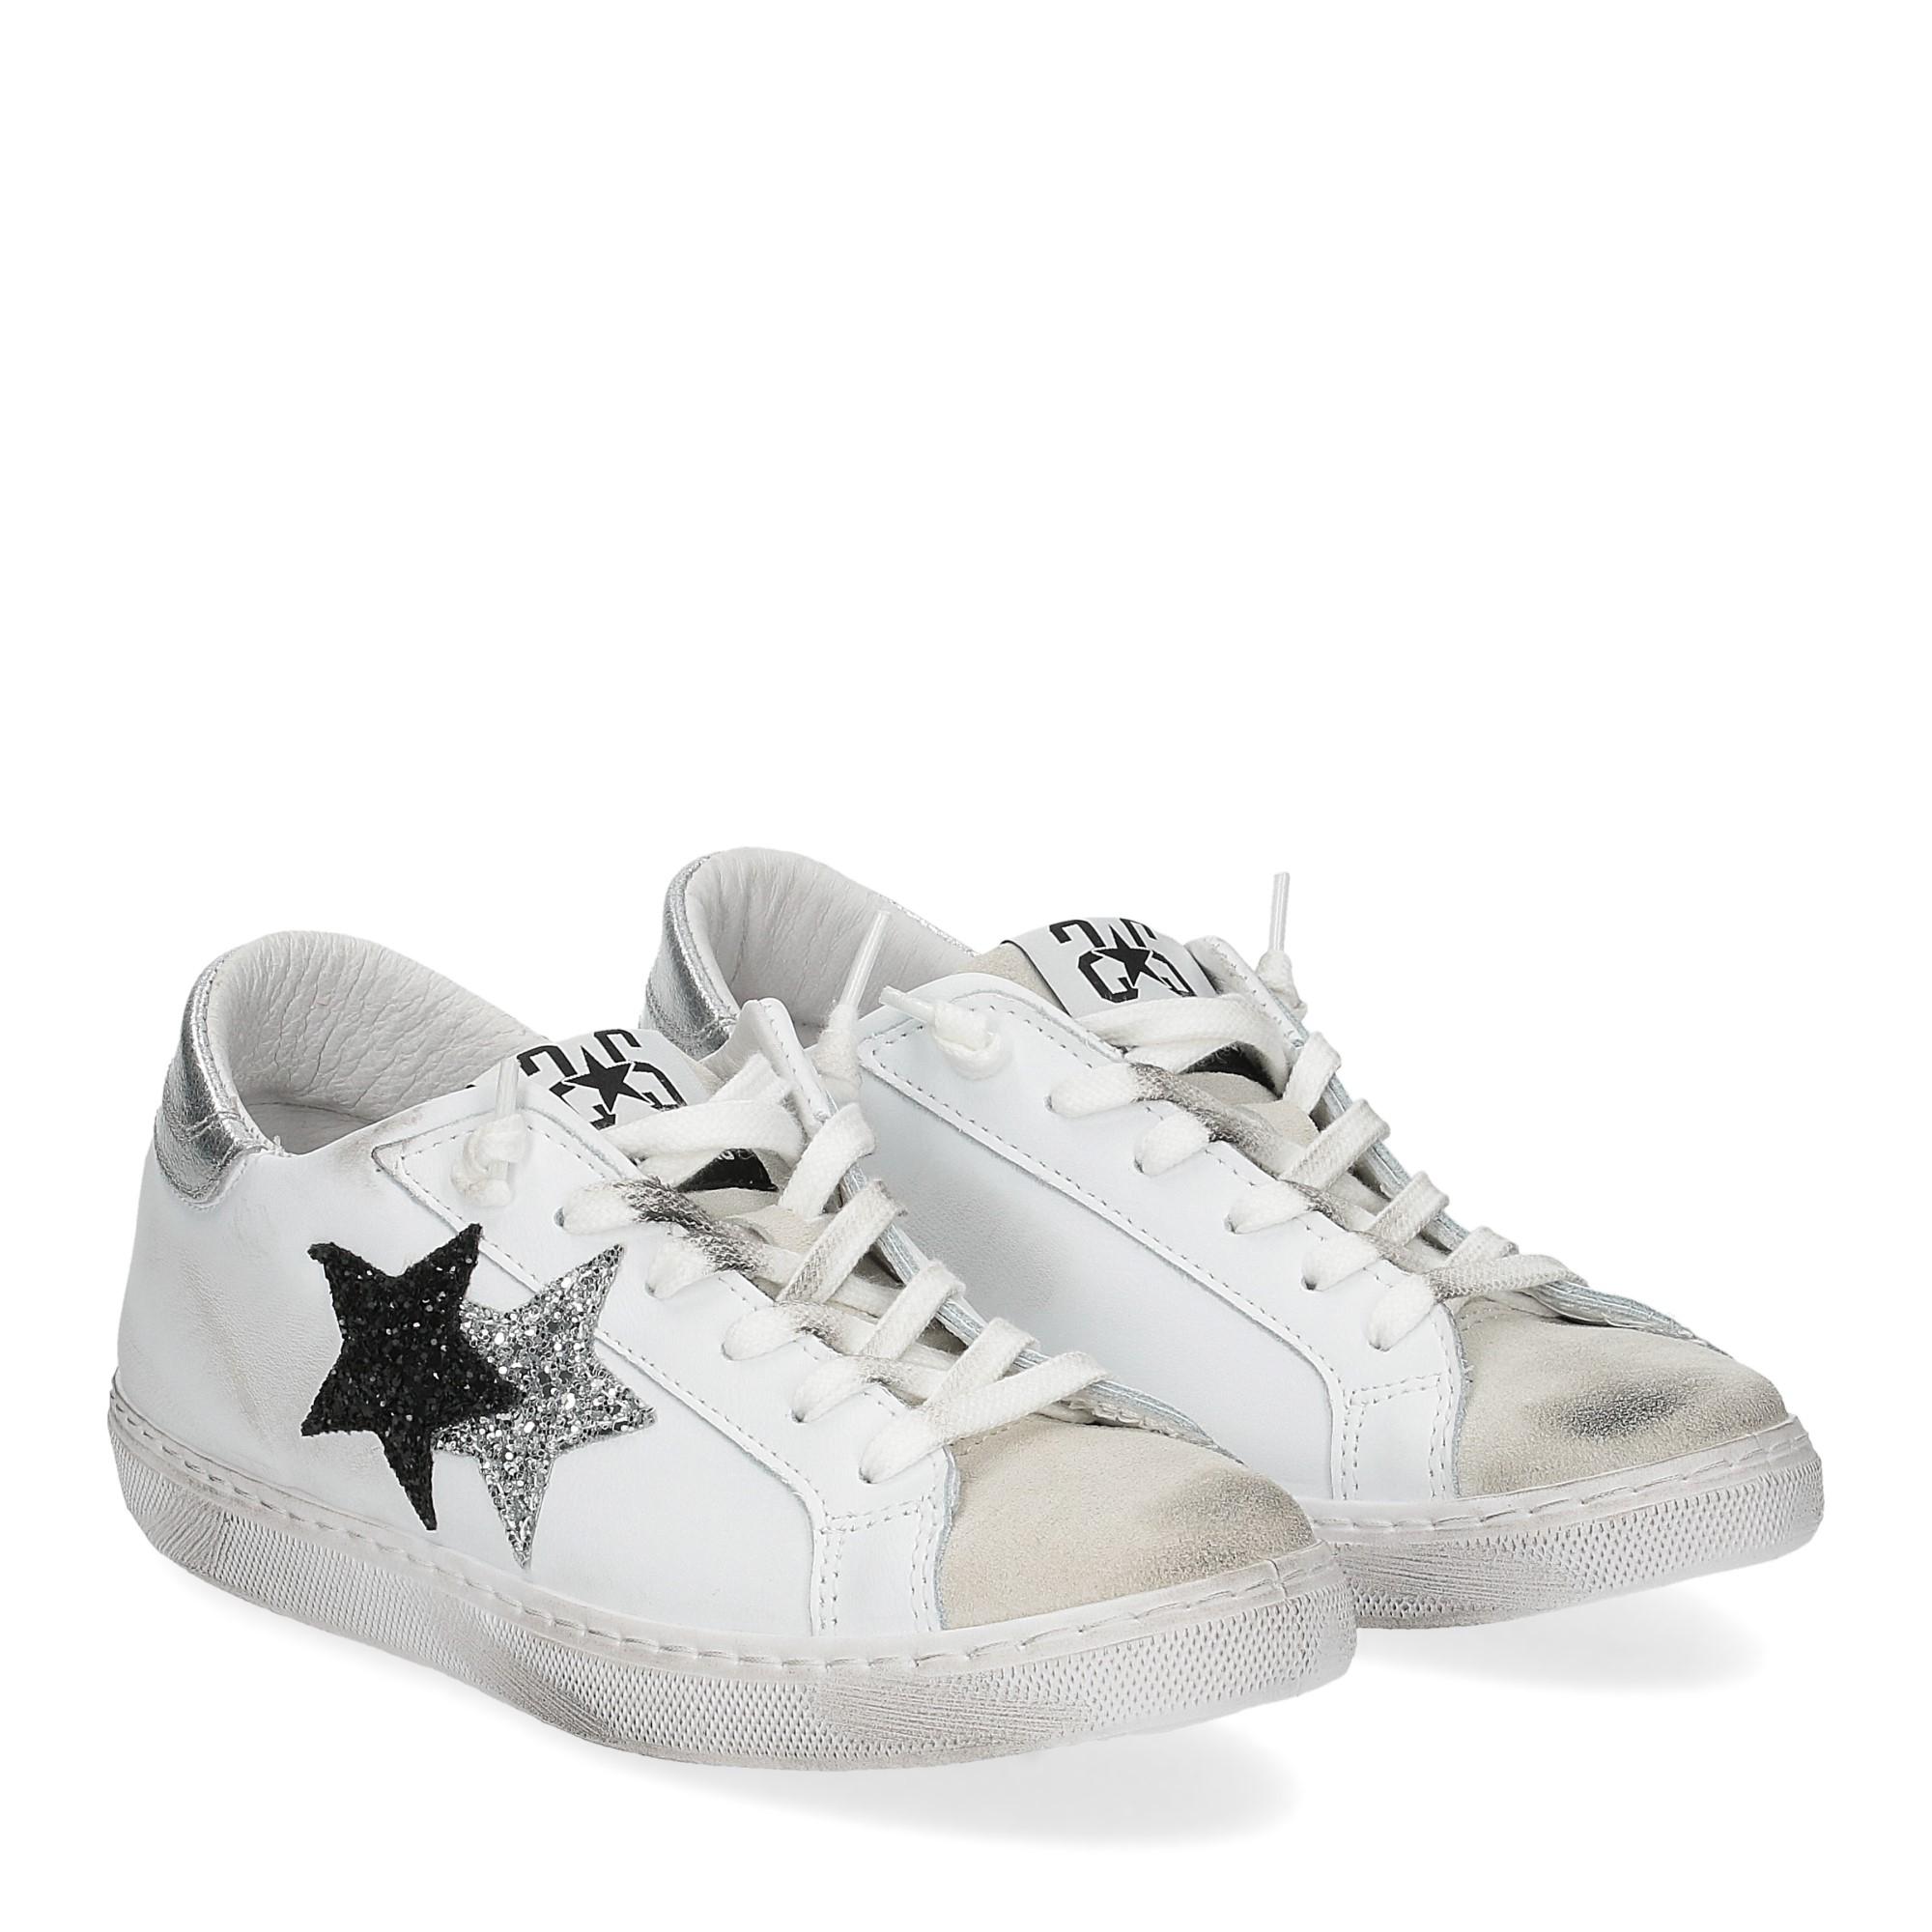 2Star 2814 sneaker bianco glitter nero